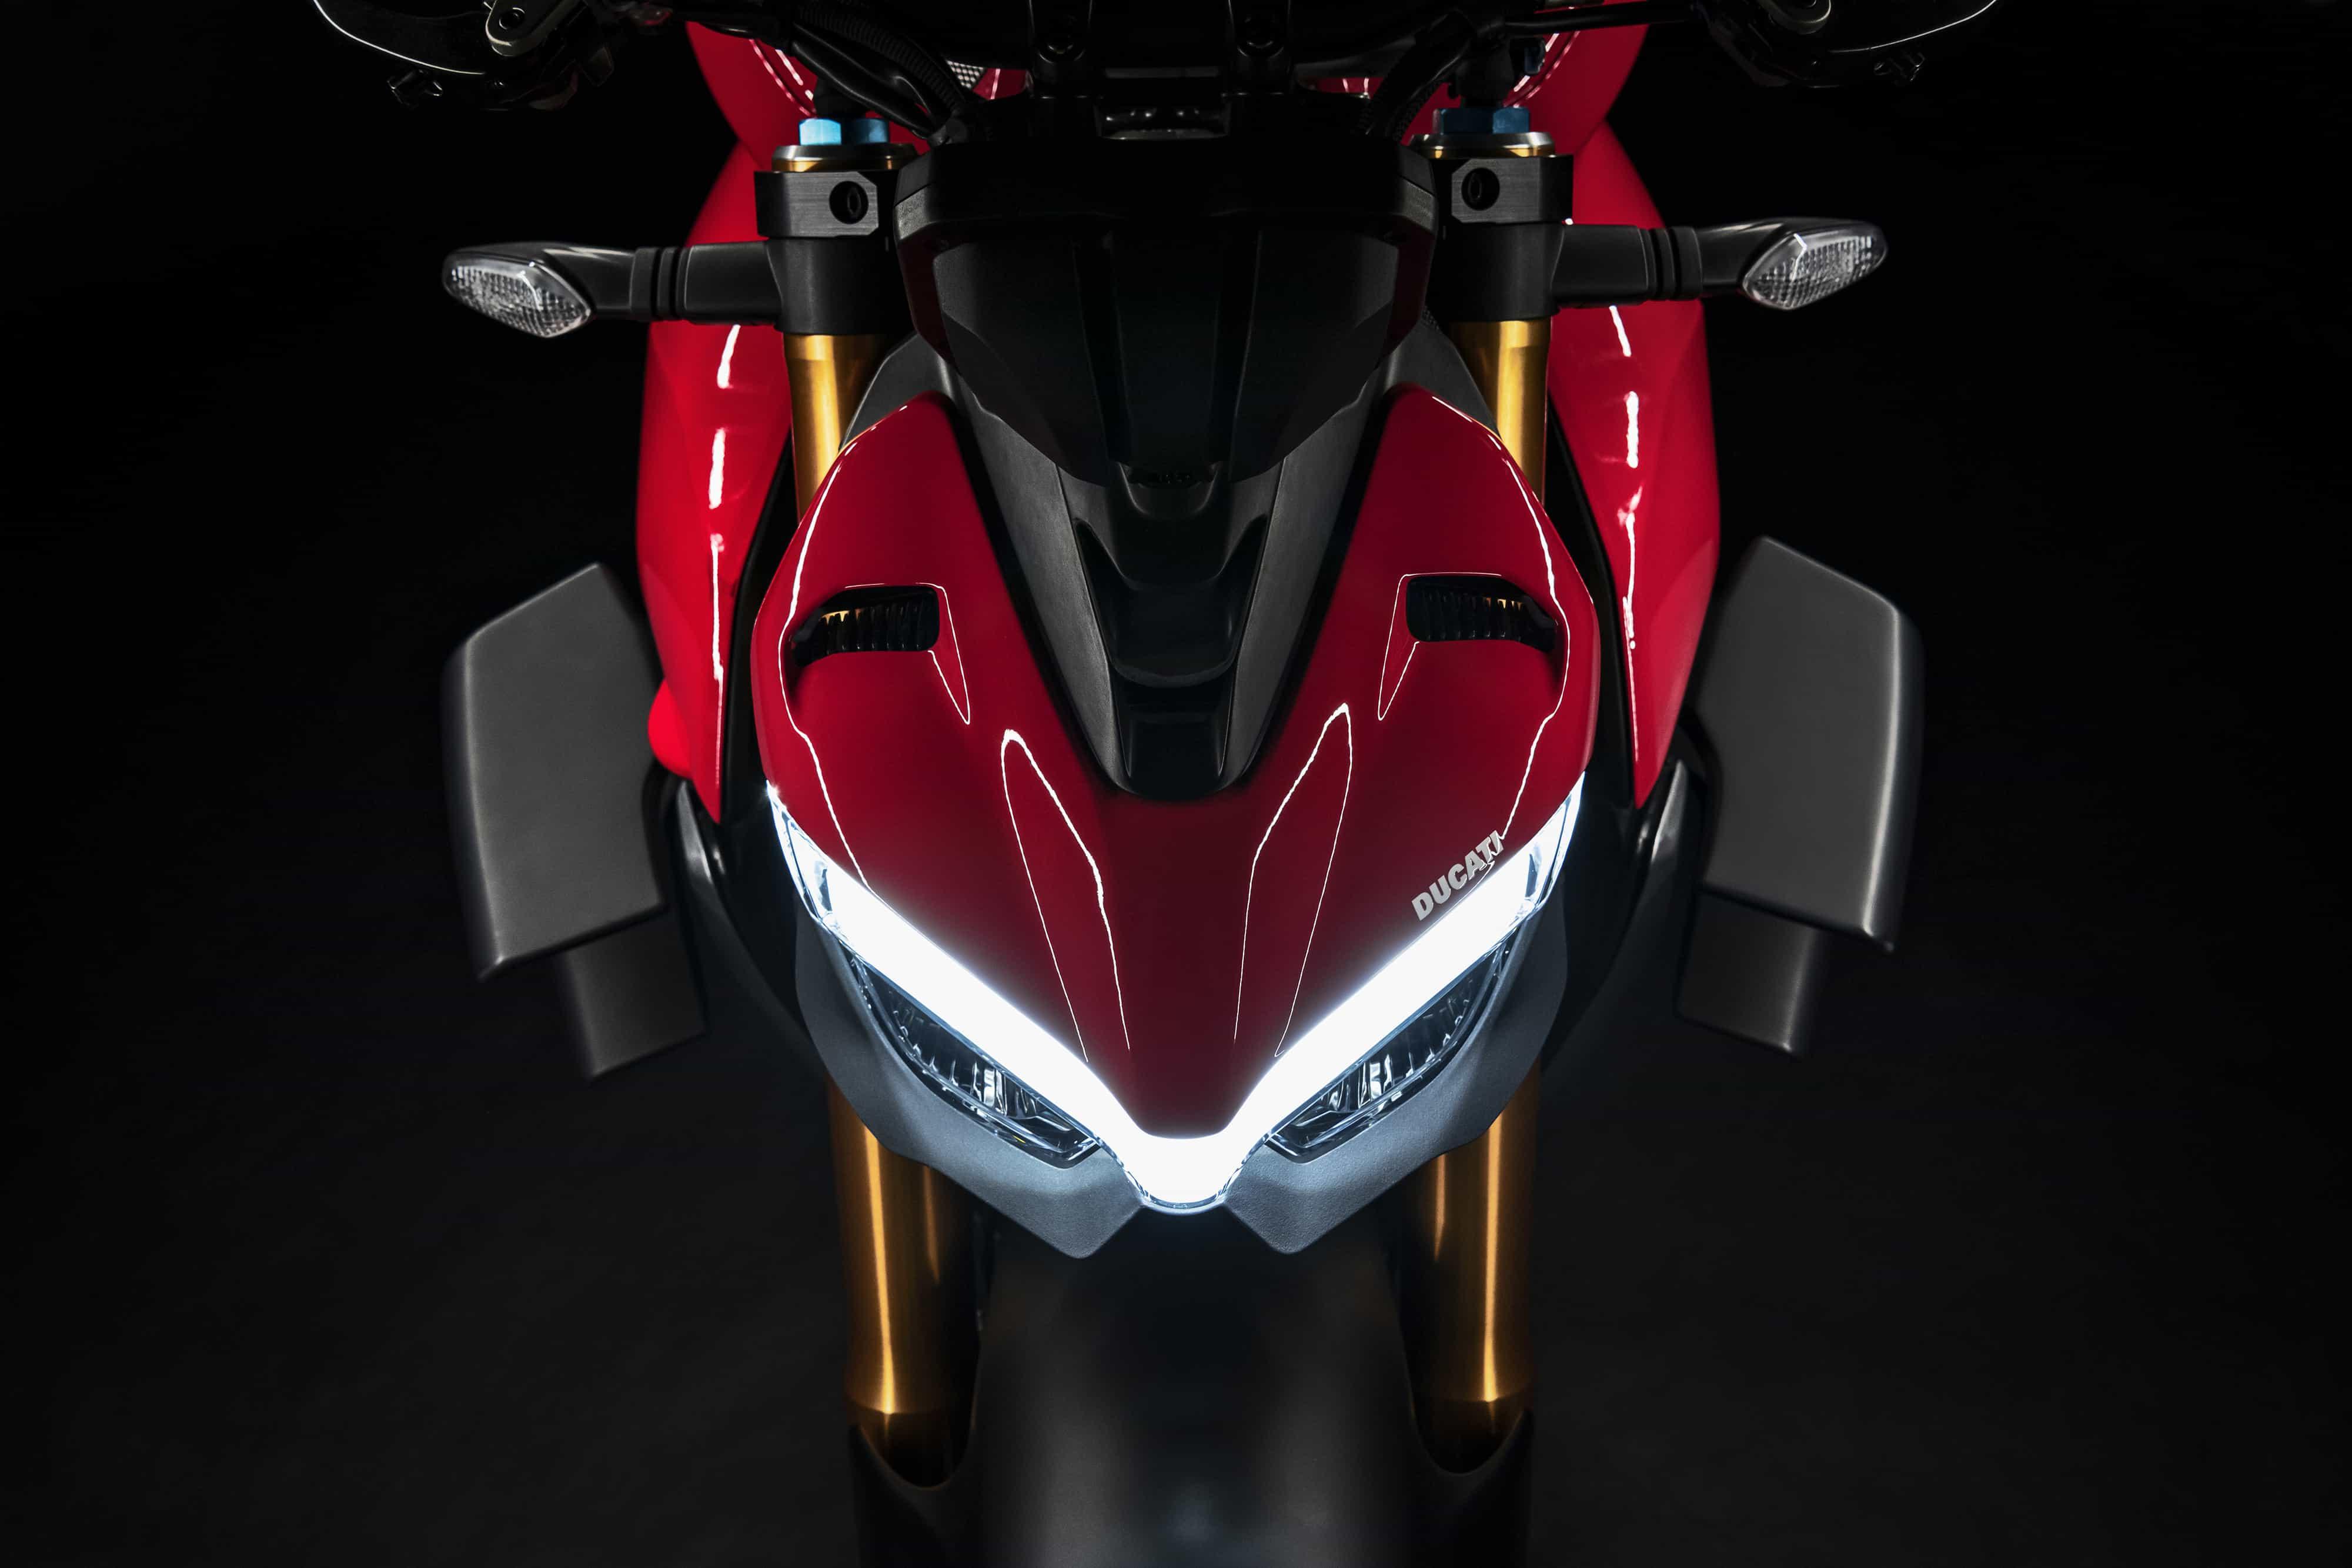 Ducati DucatiワールドプレミアでストリートファイターV4を発表